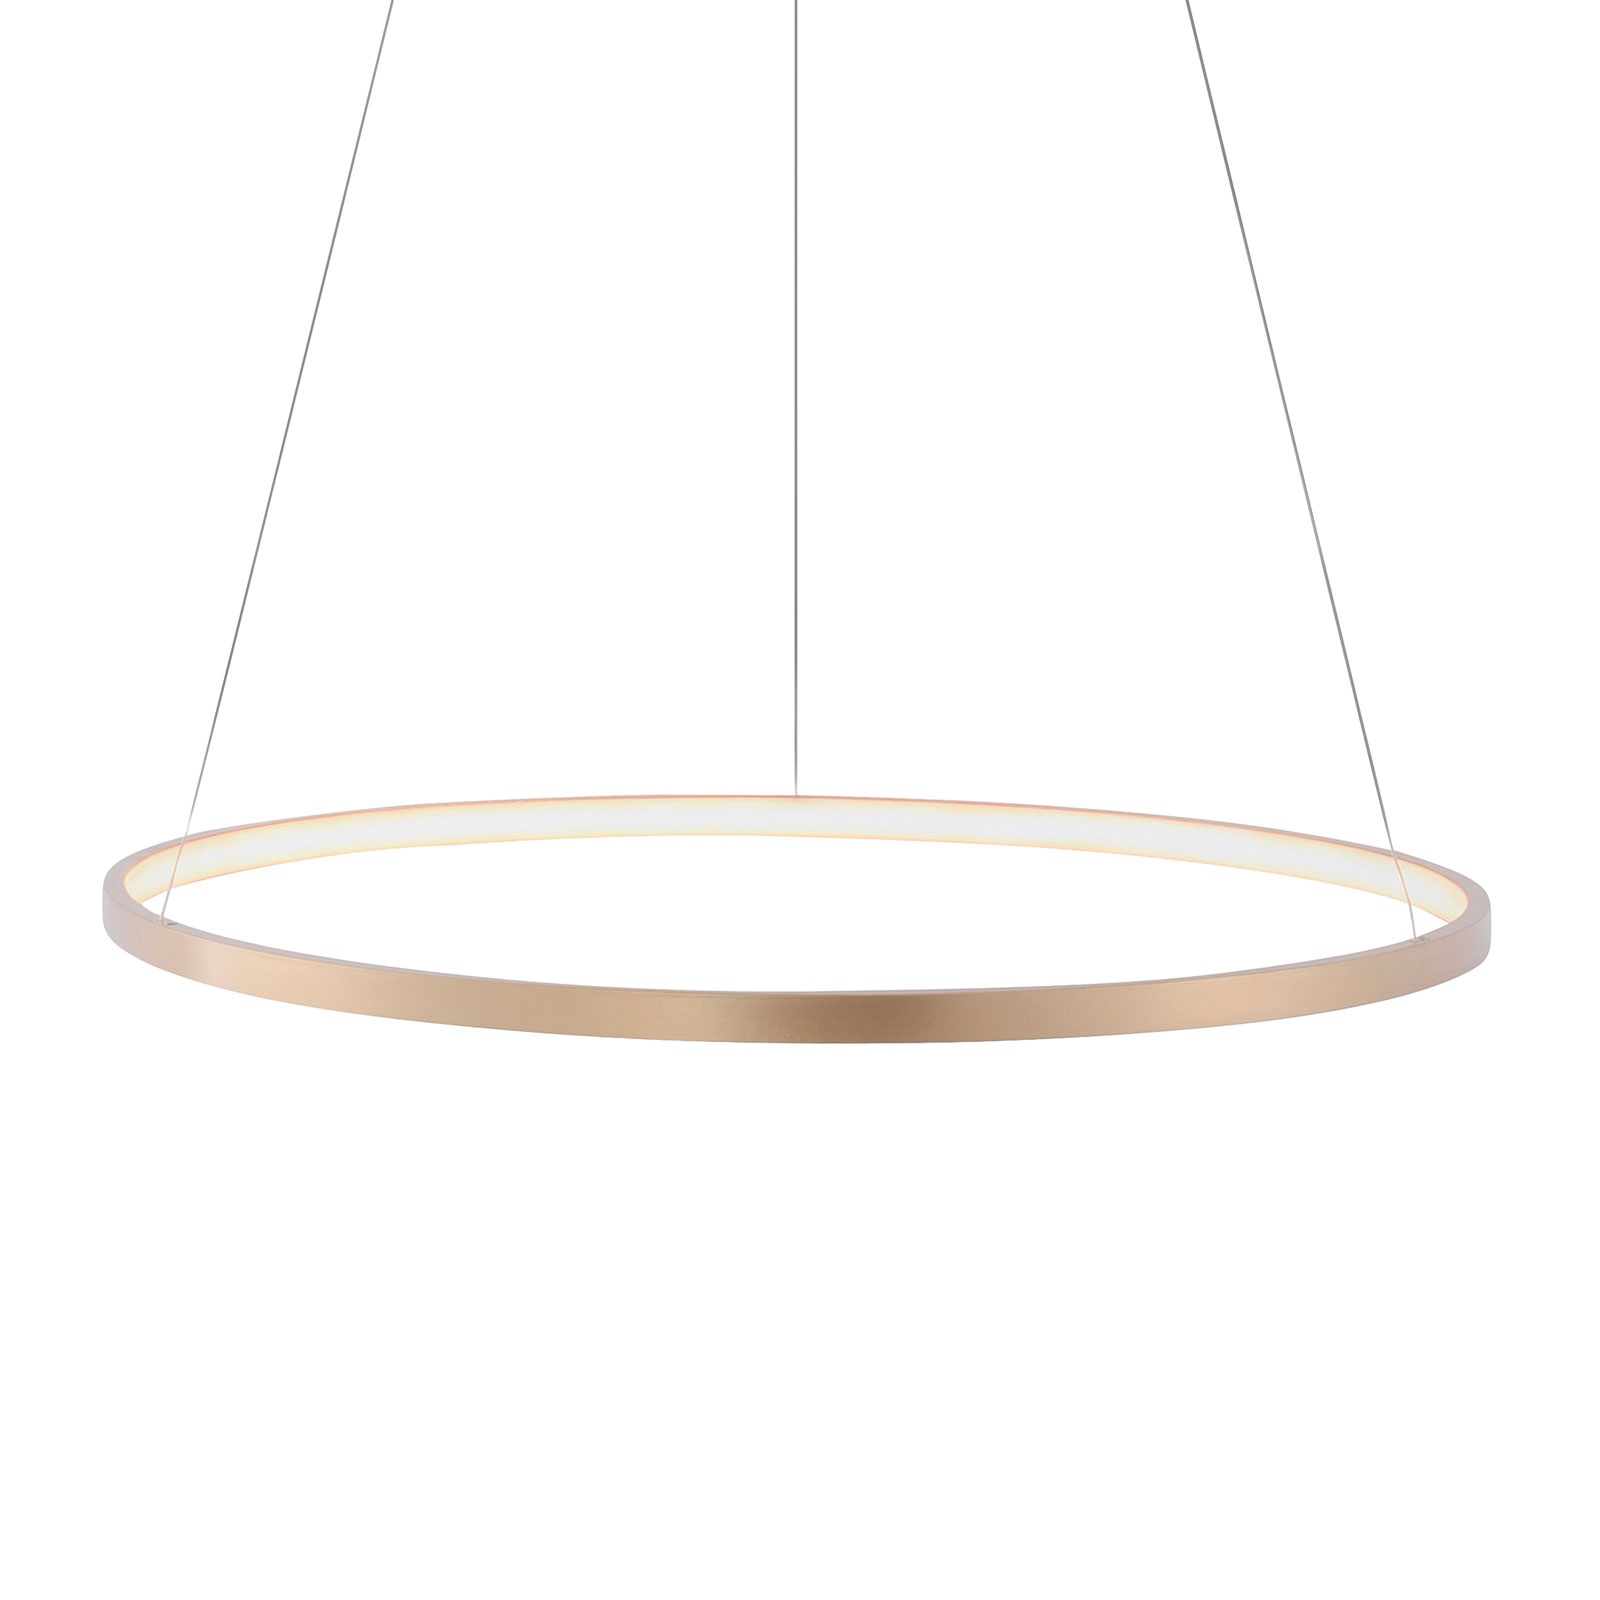 LED-Pendelleuchte Circle gold, Ø 60 cm